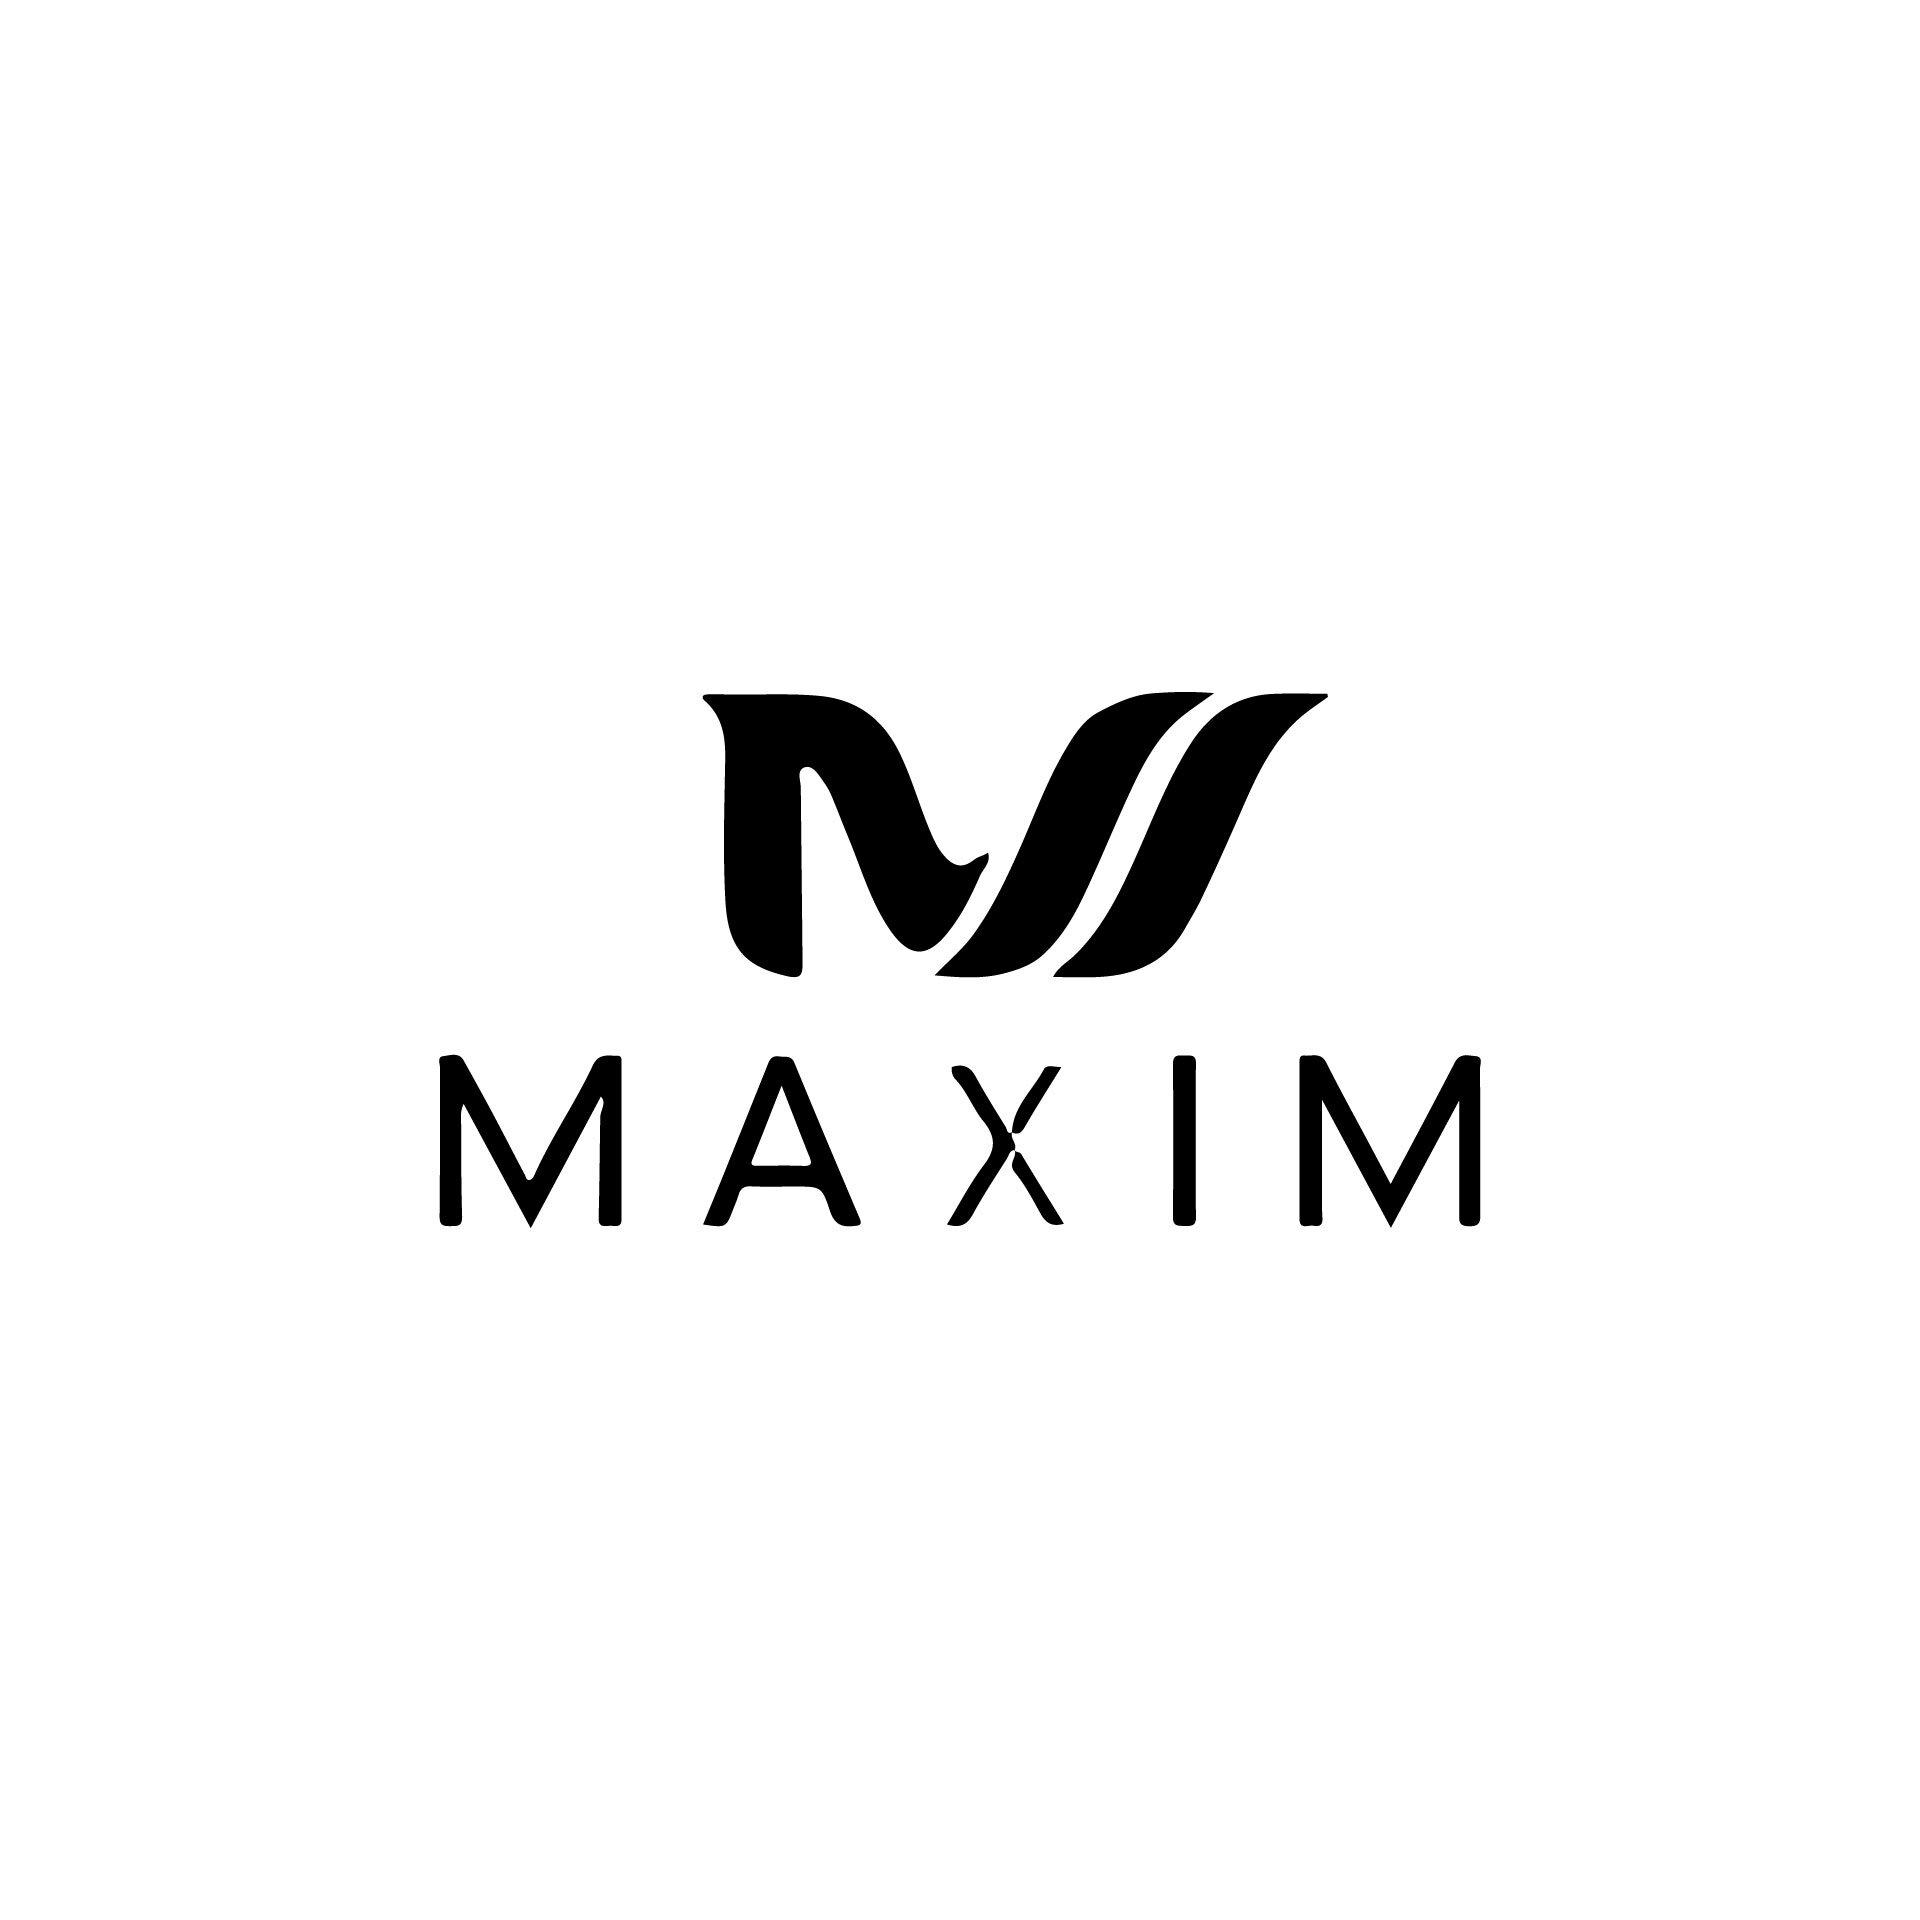 ADMark Logos 235136-20.jpg